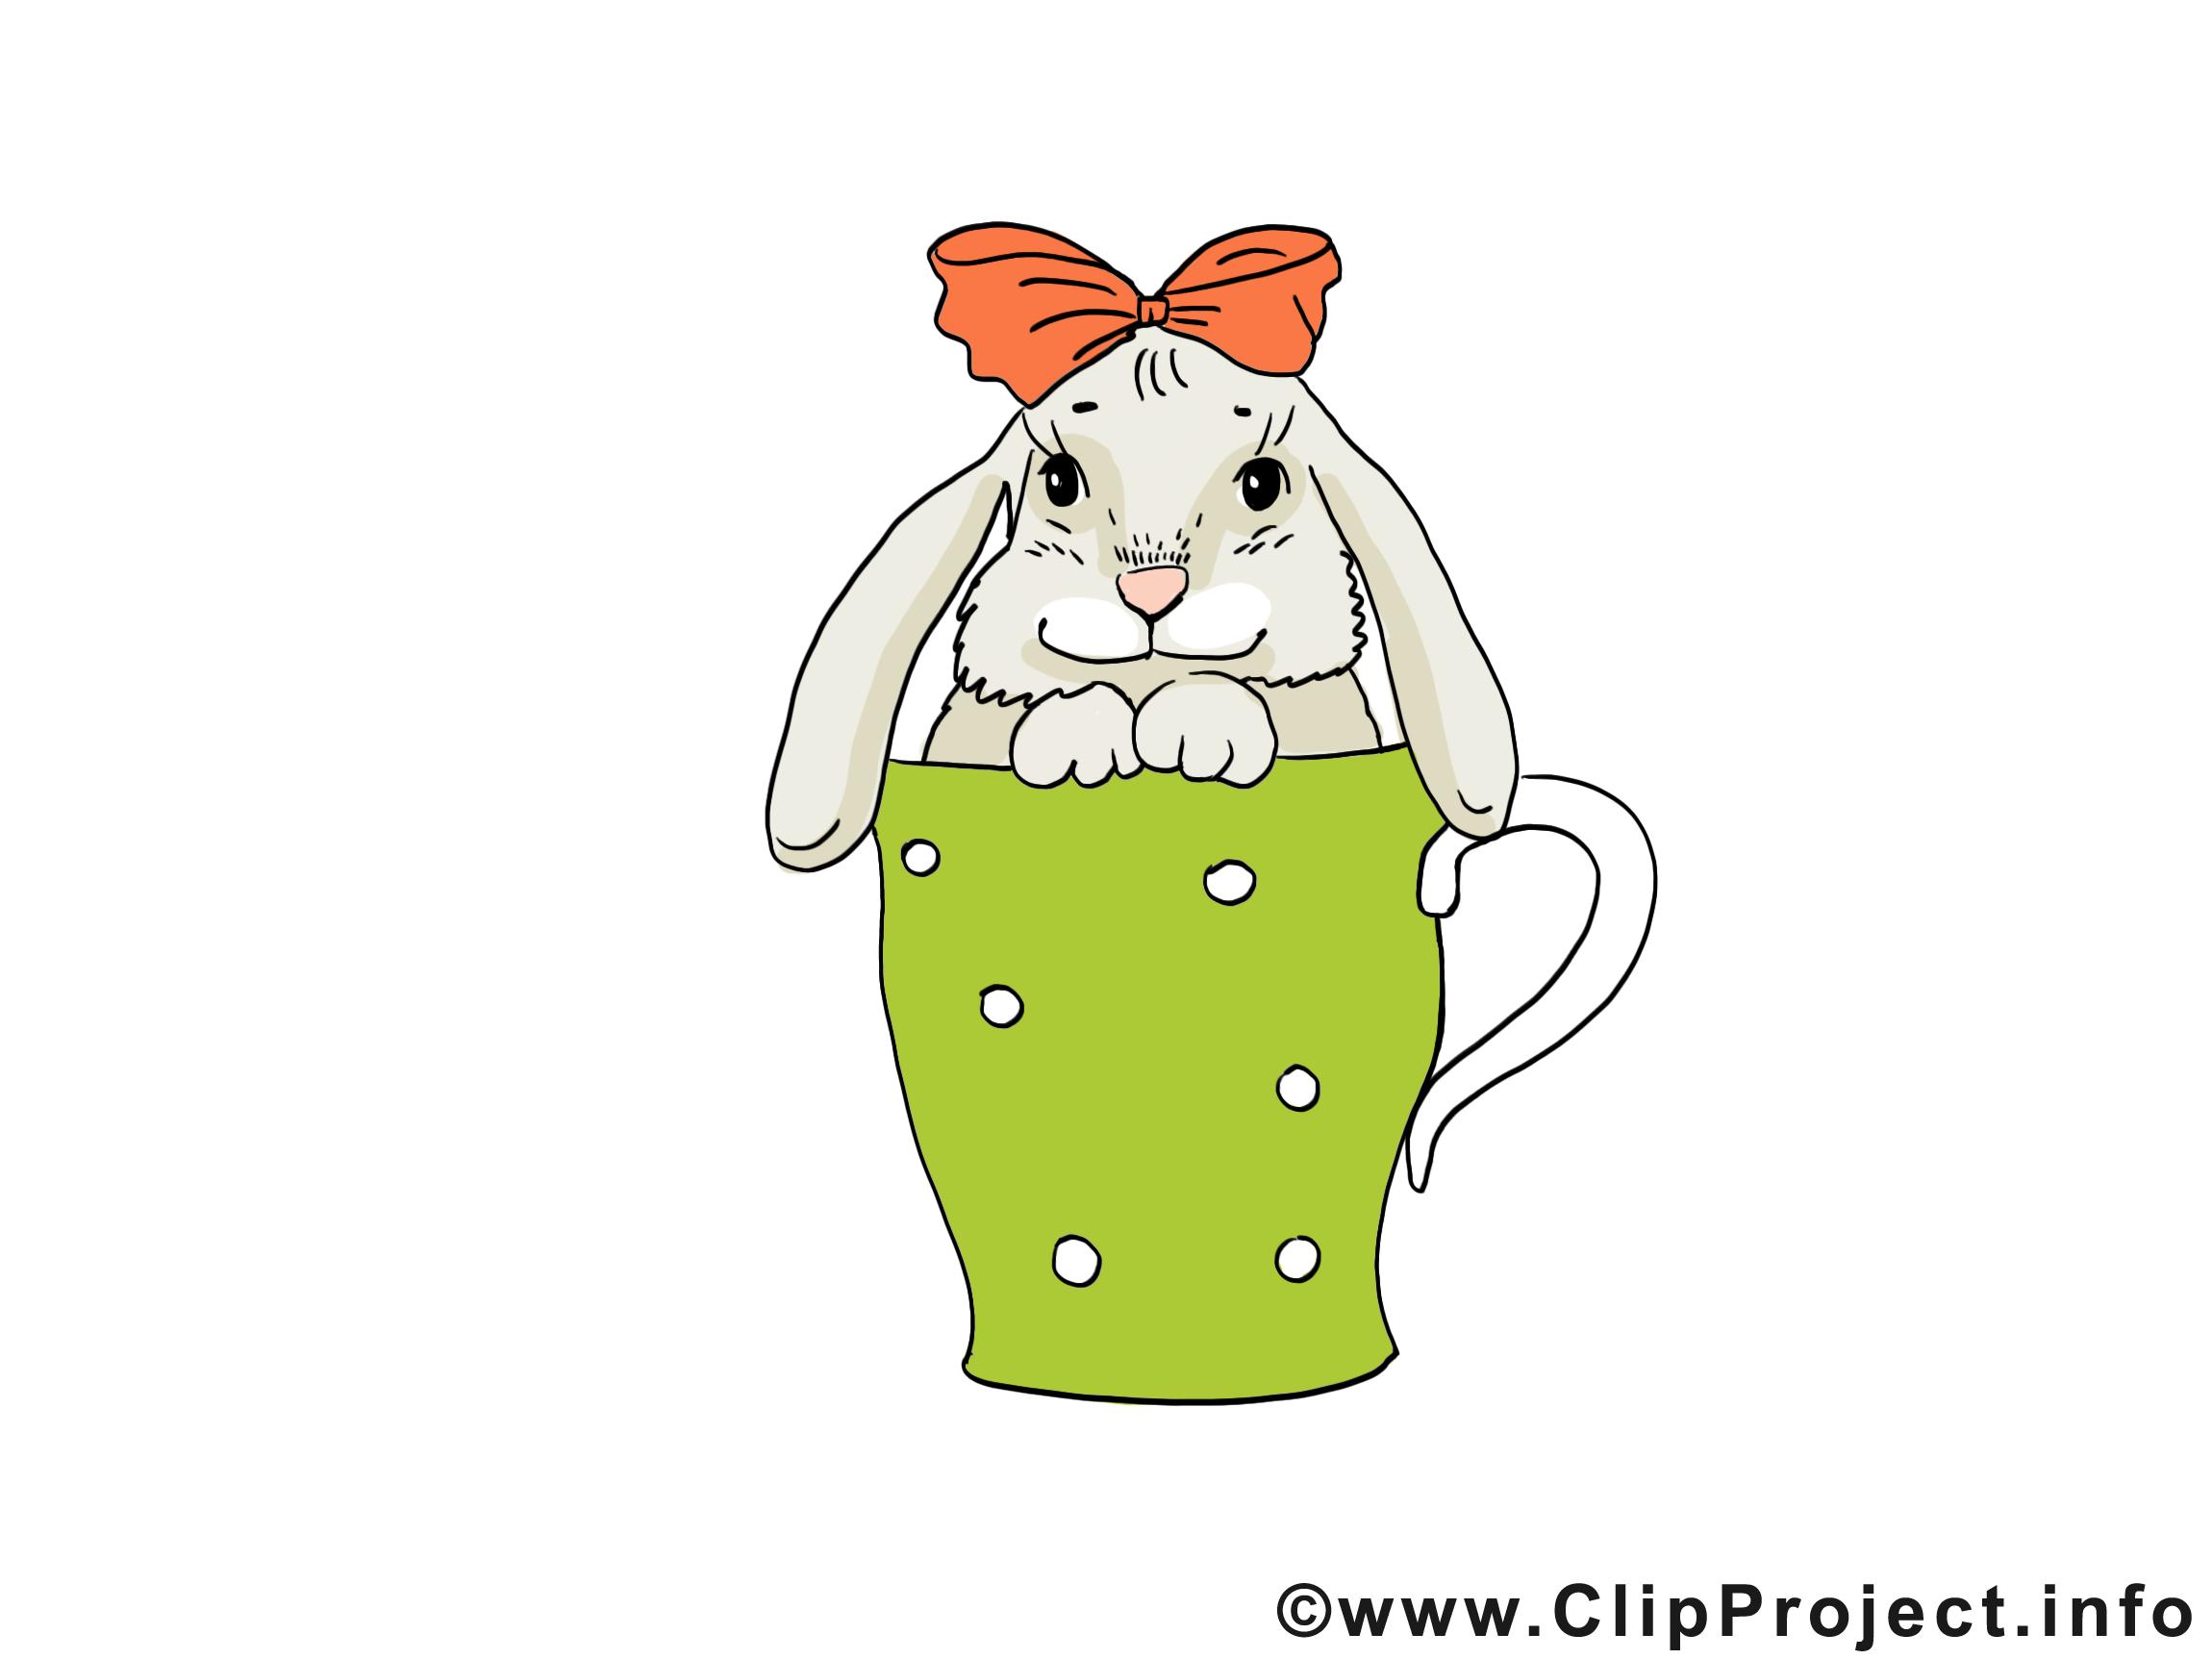 Tasse lapin dessin gratuit - Pâques image